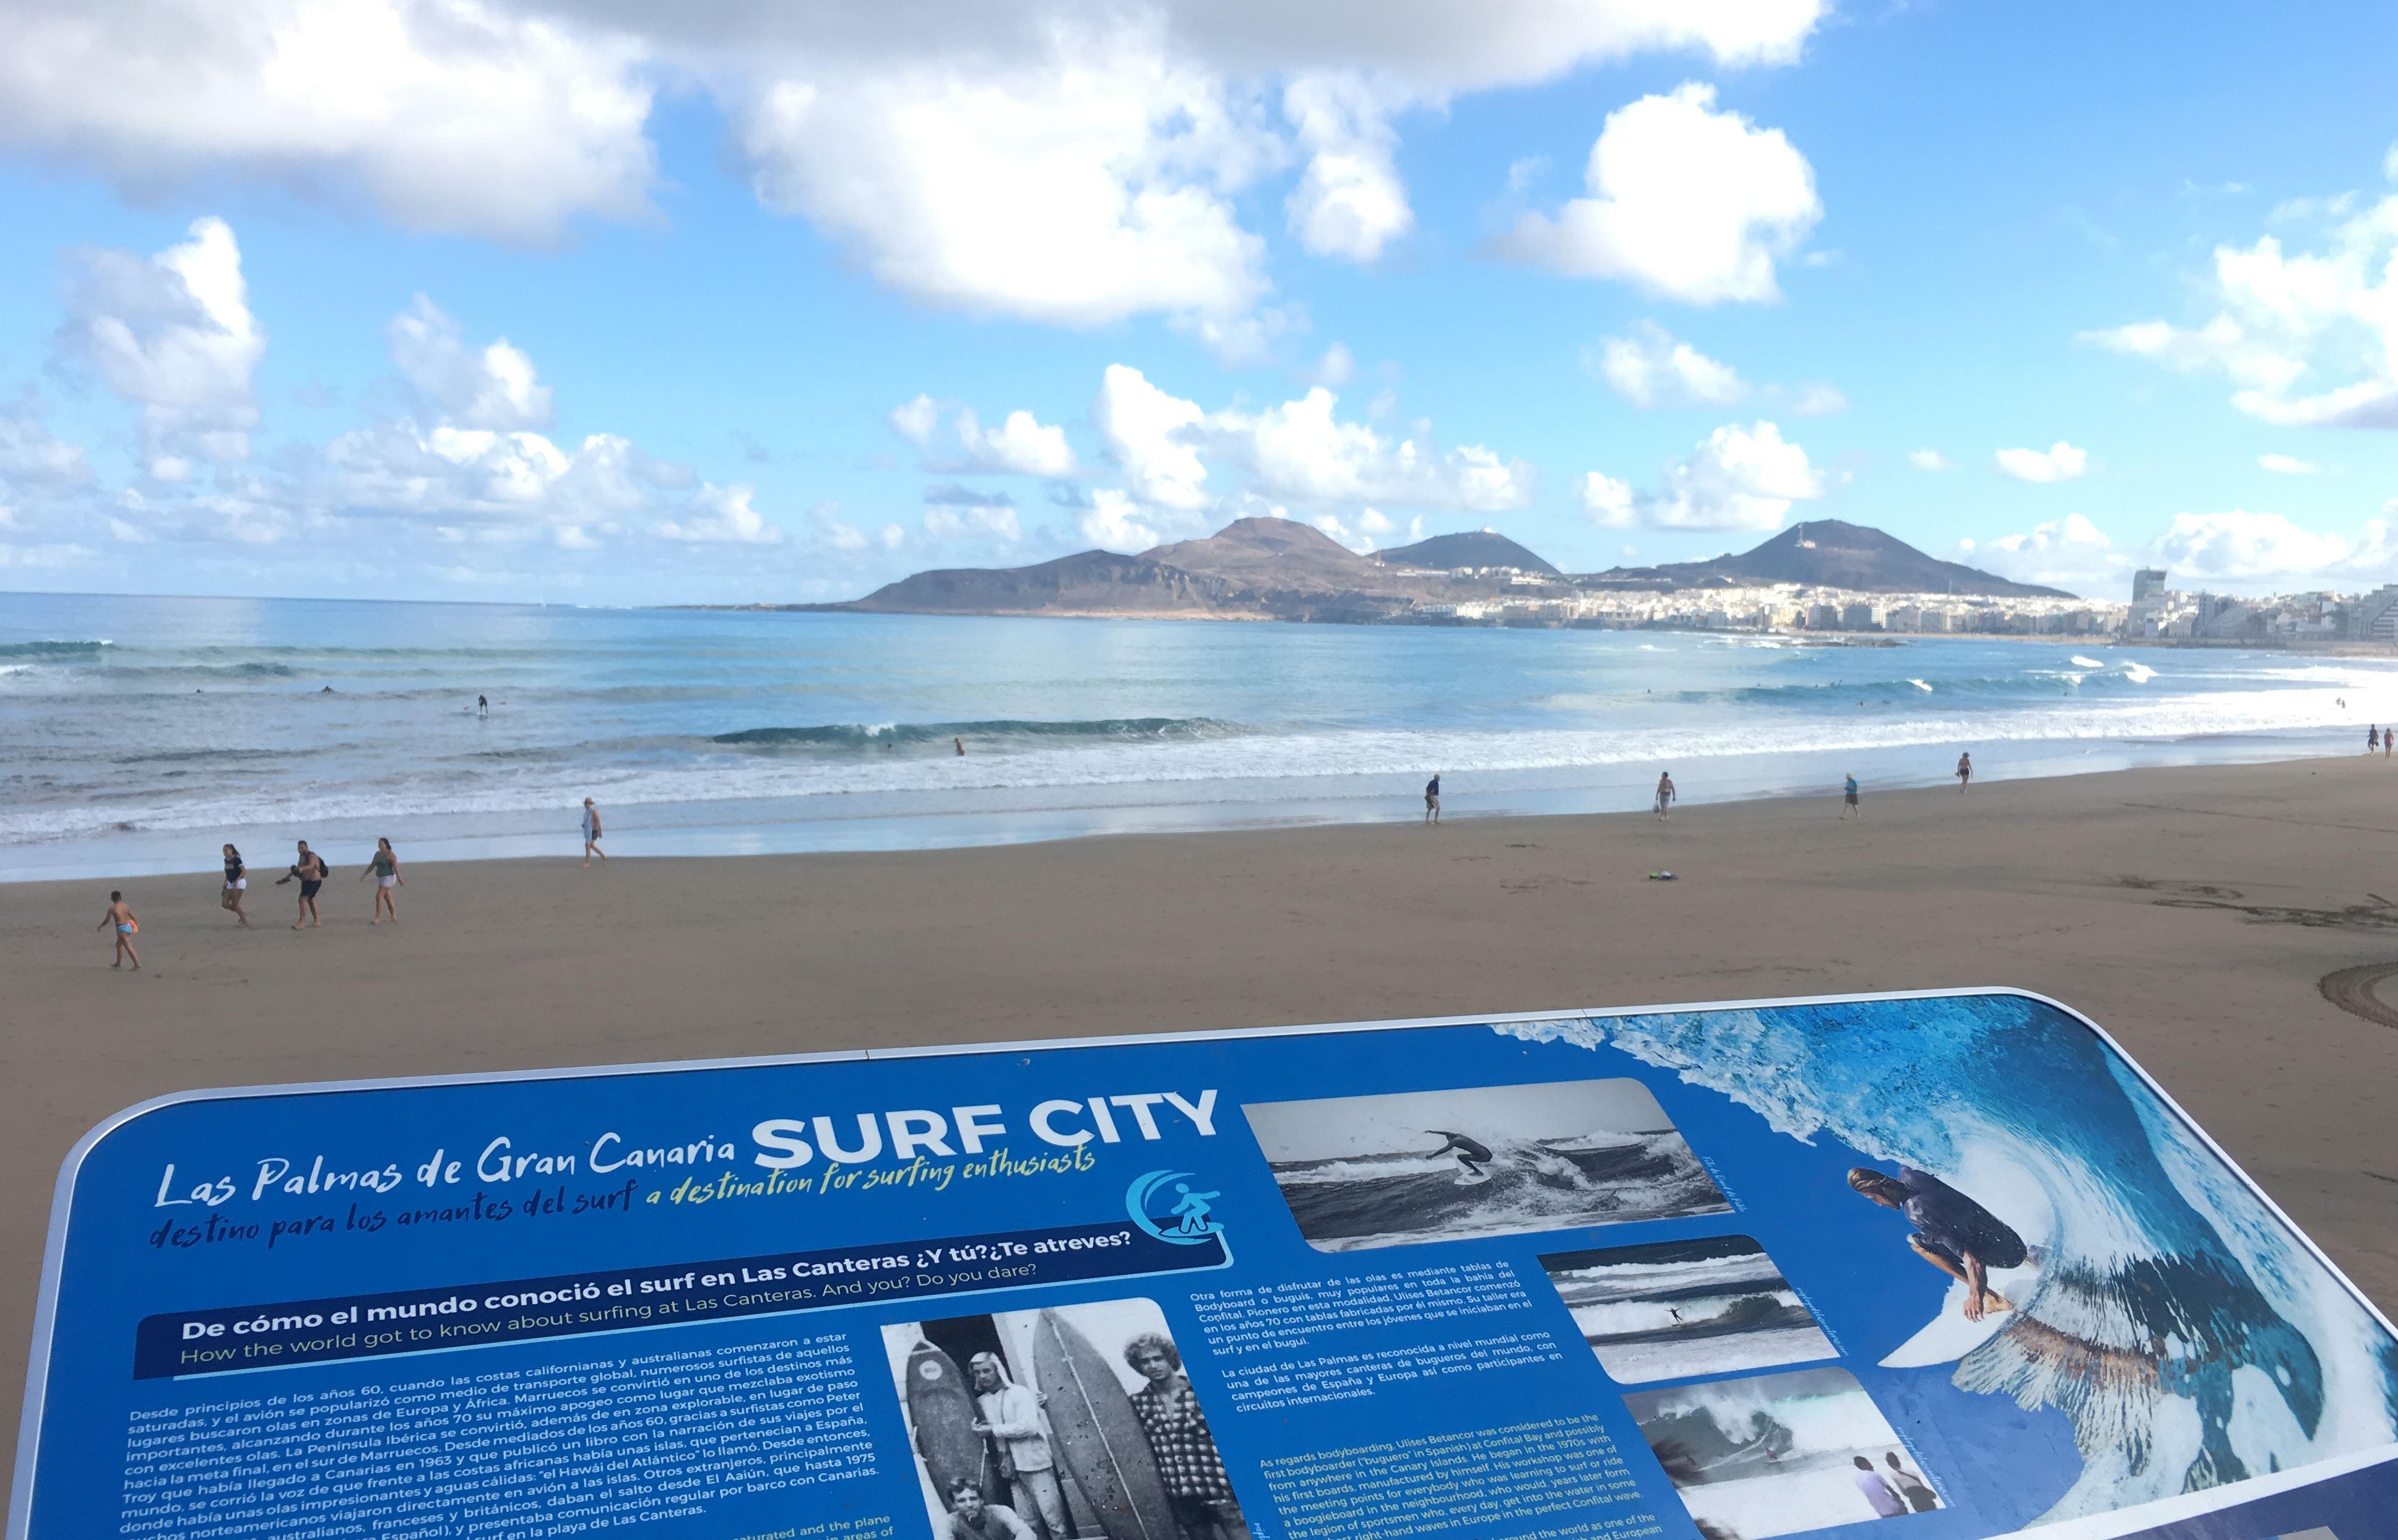 Surfen in Las Palmas